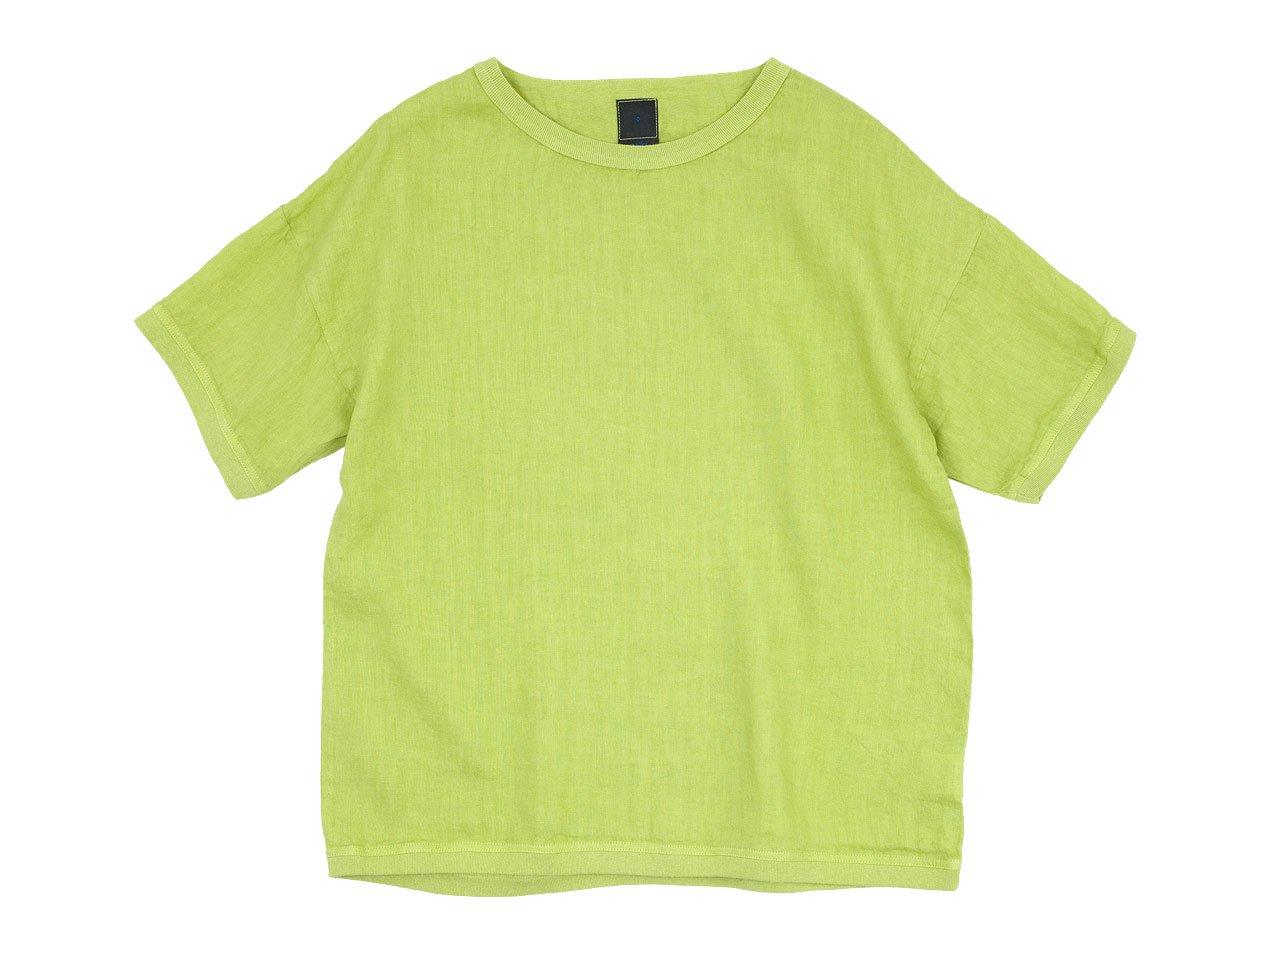 maillot linen shirts Tee LIME